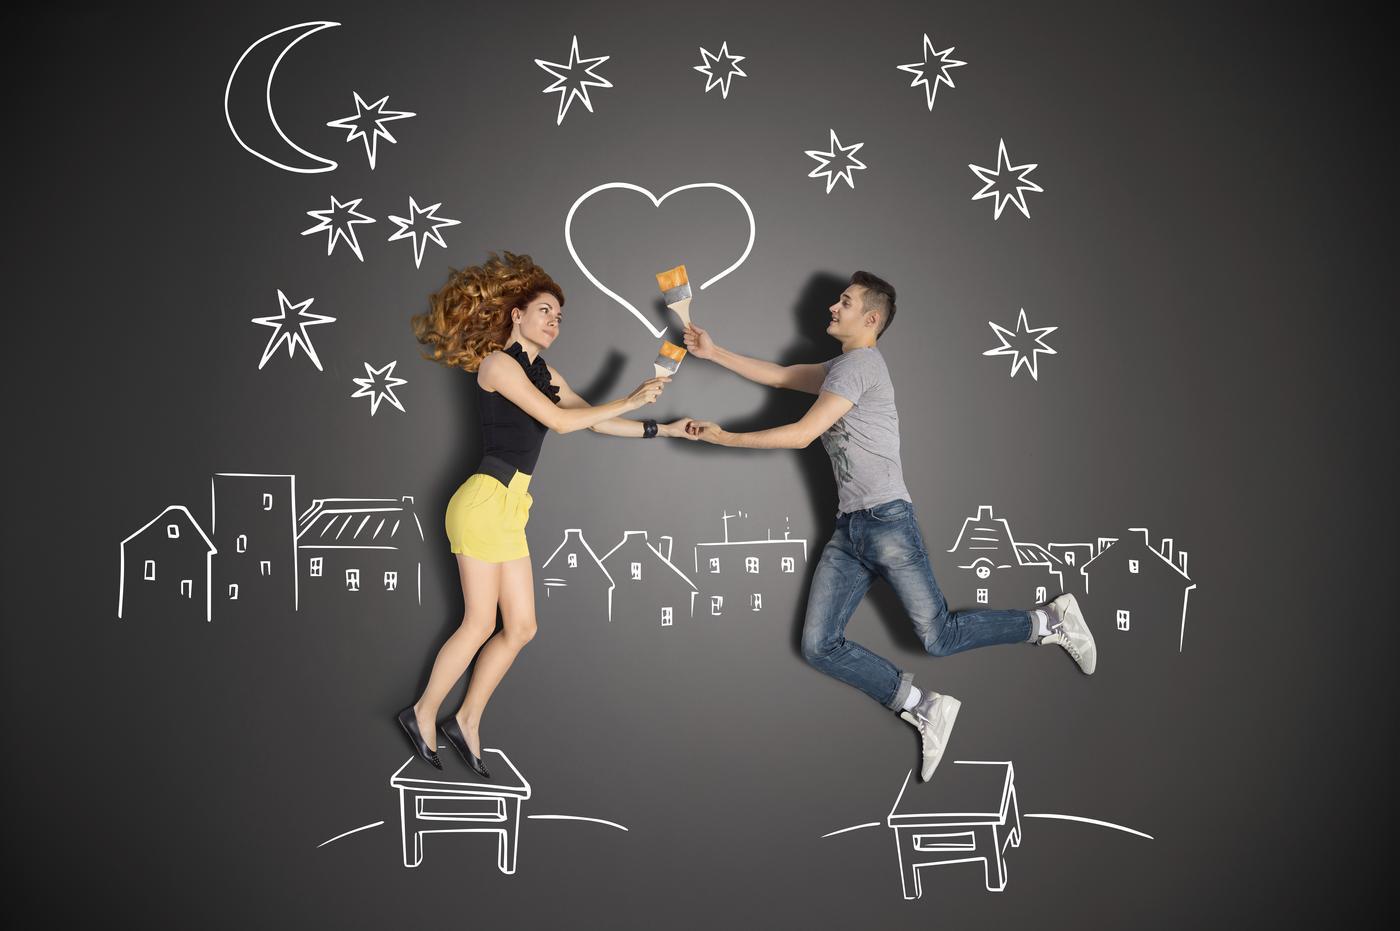 10 tips to help you find a boyfriend by Valentine's Day